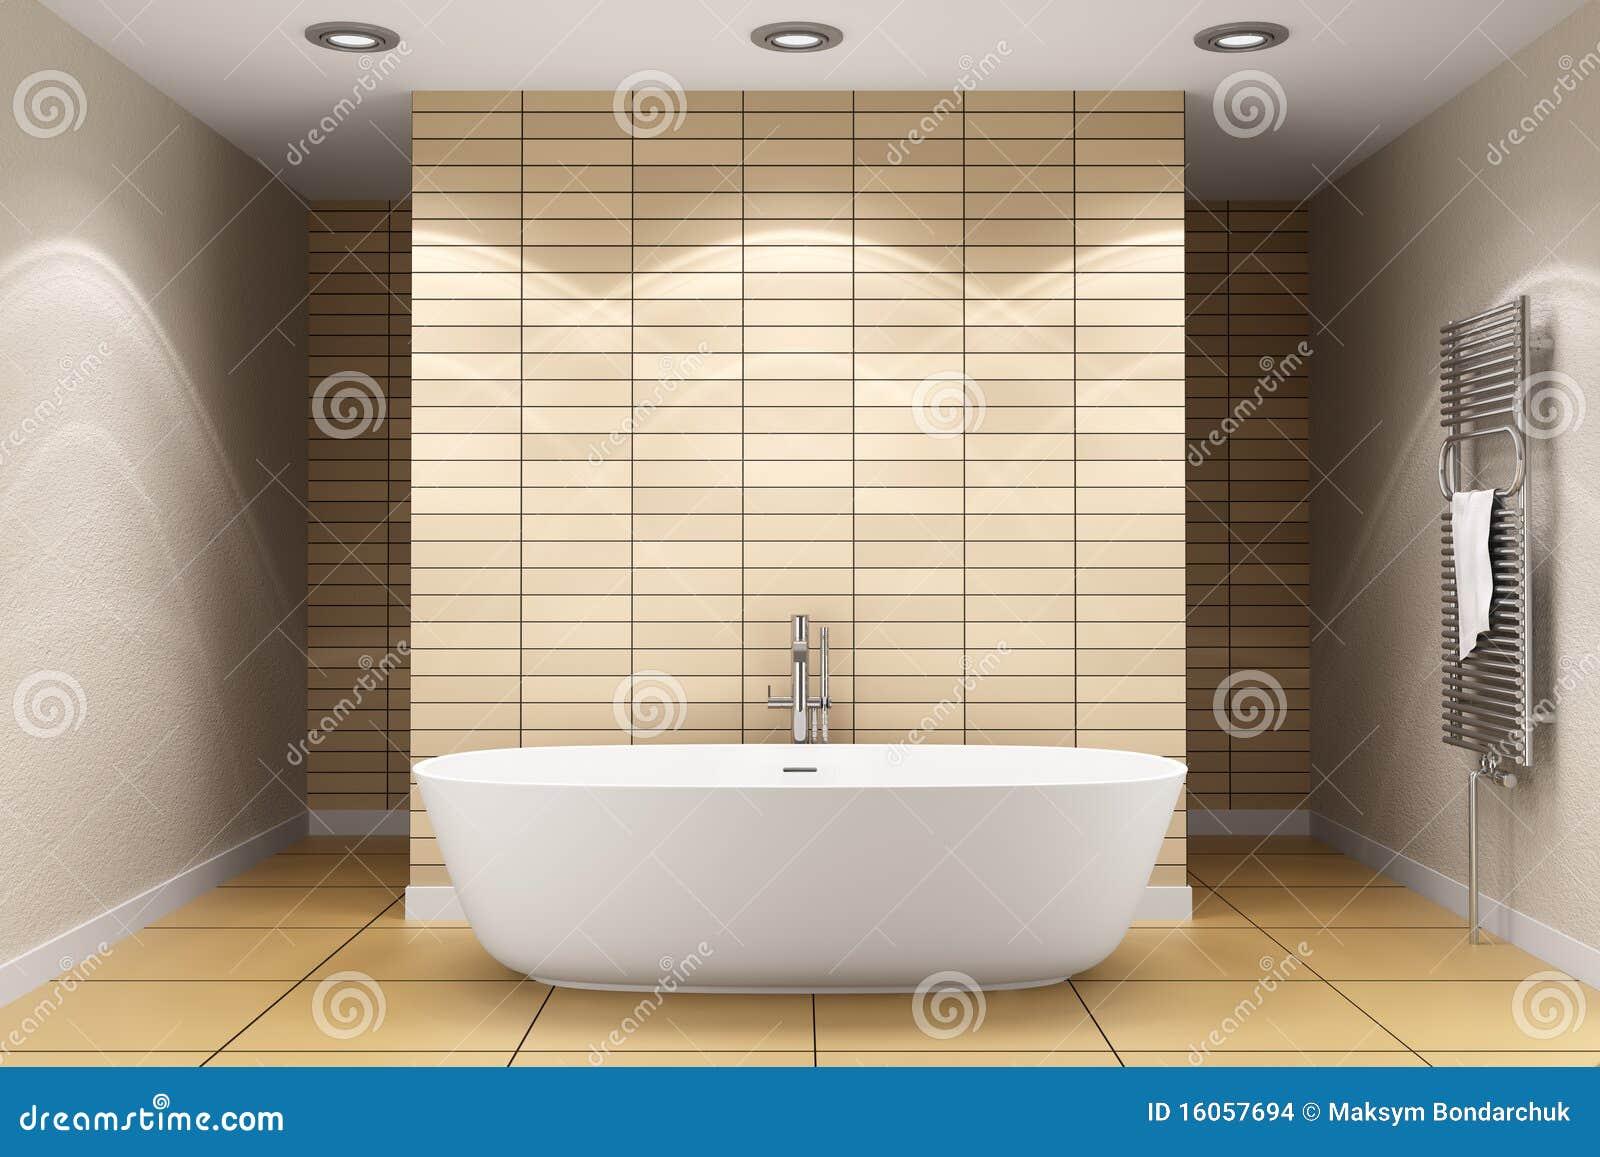 Decoratie Badkamer Muur : Moderne badkamers met beige tegels op muur stock foto afbeelding